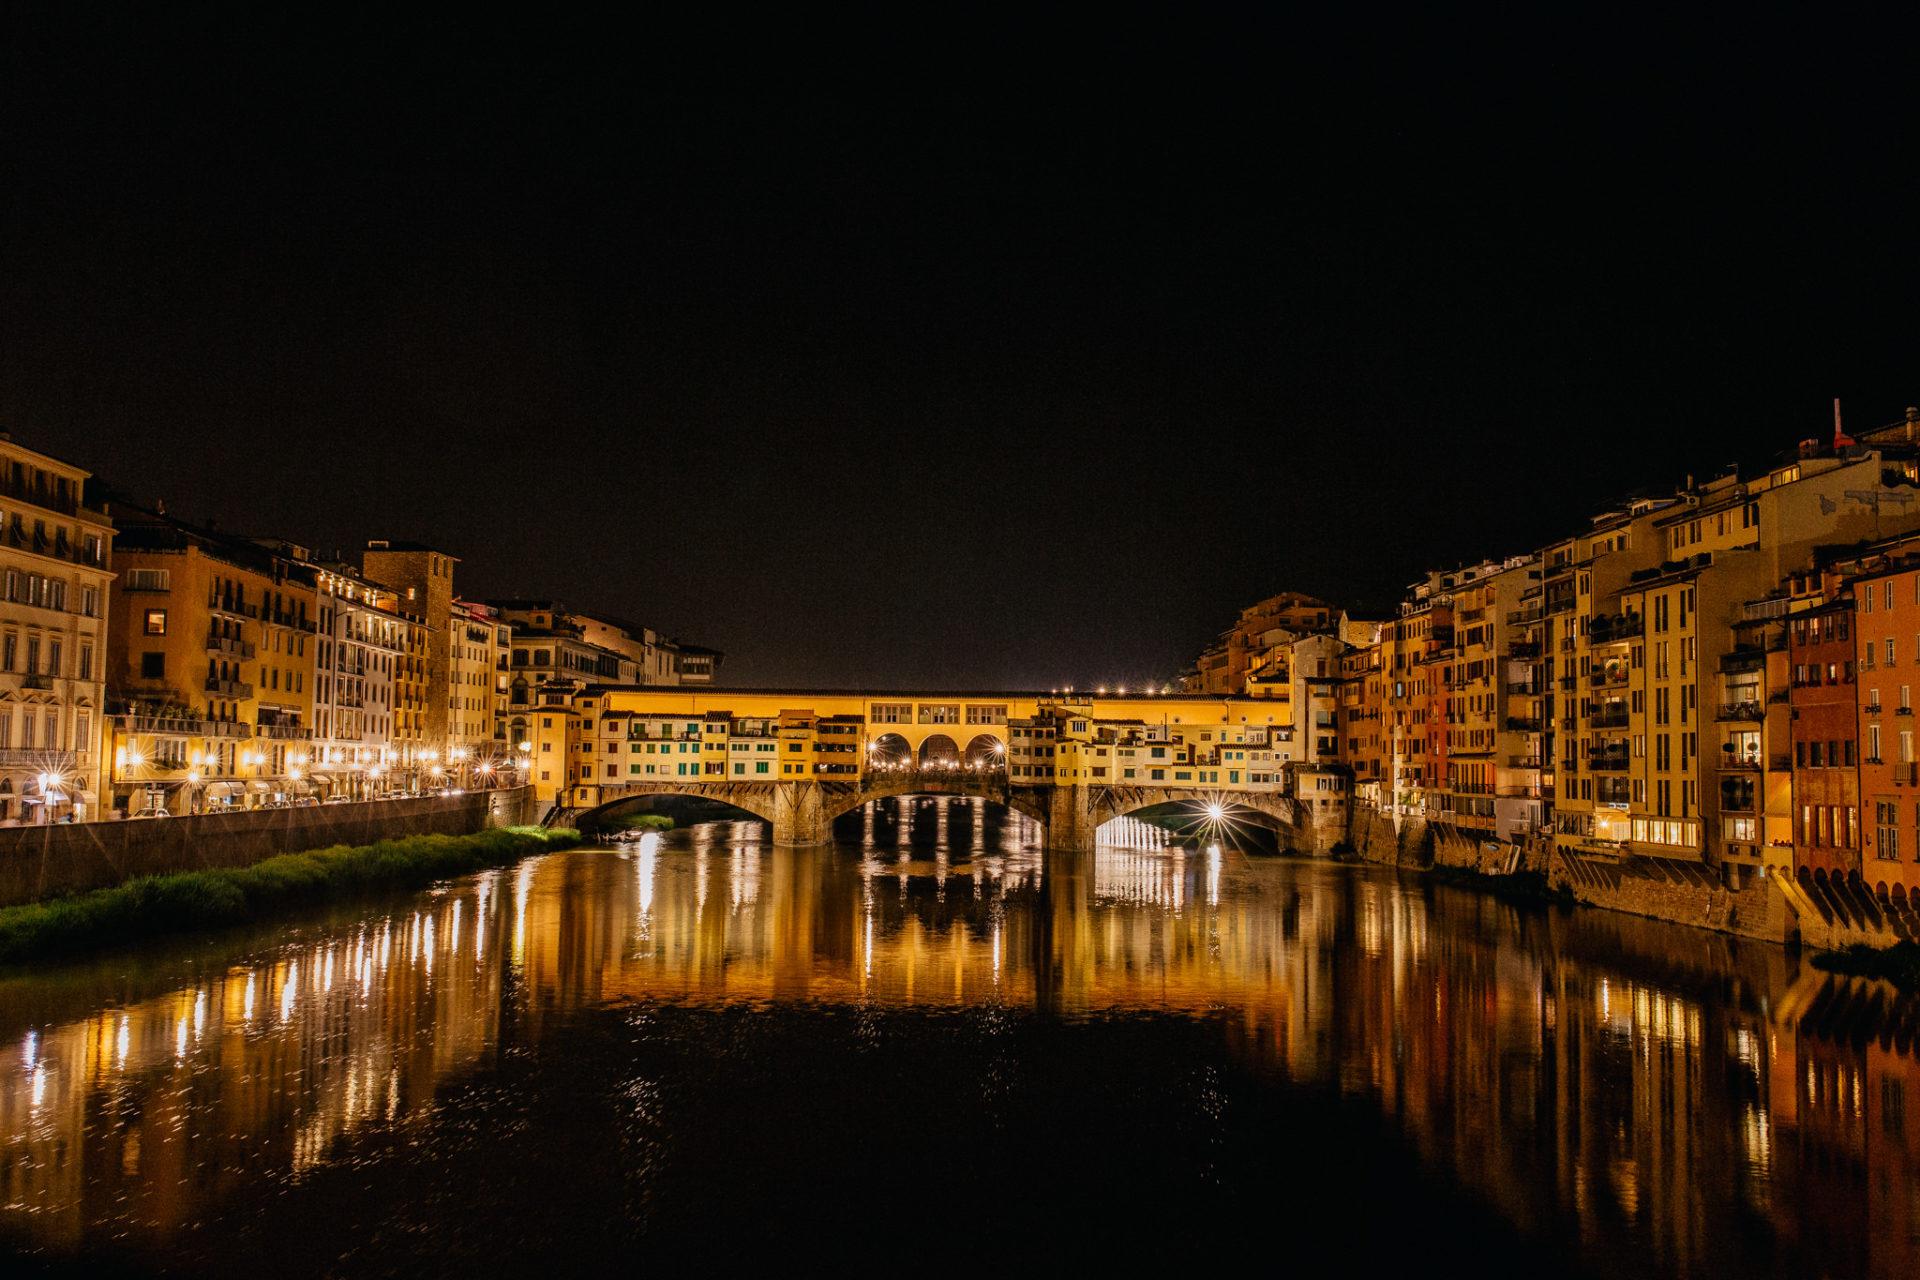 wedding photographer tuscany-italy road trip with dog-florence by night-bridge vecchio